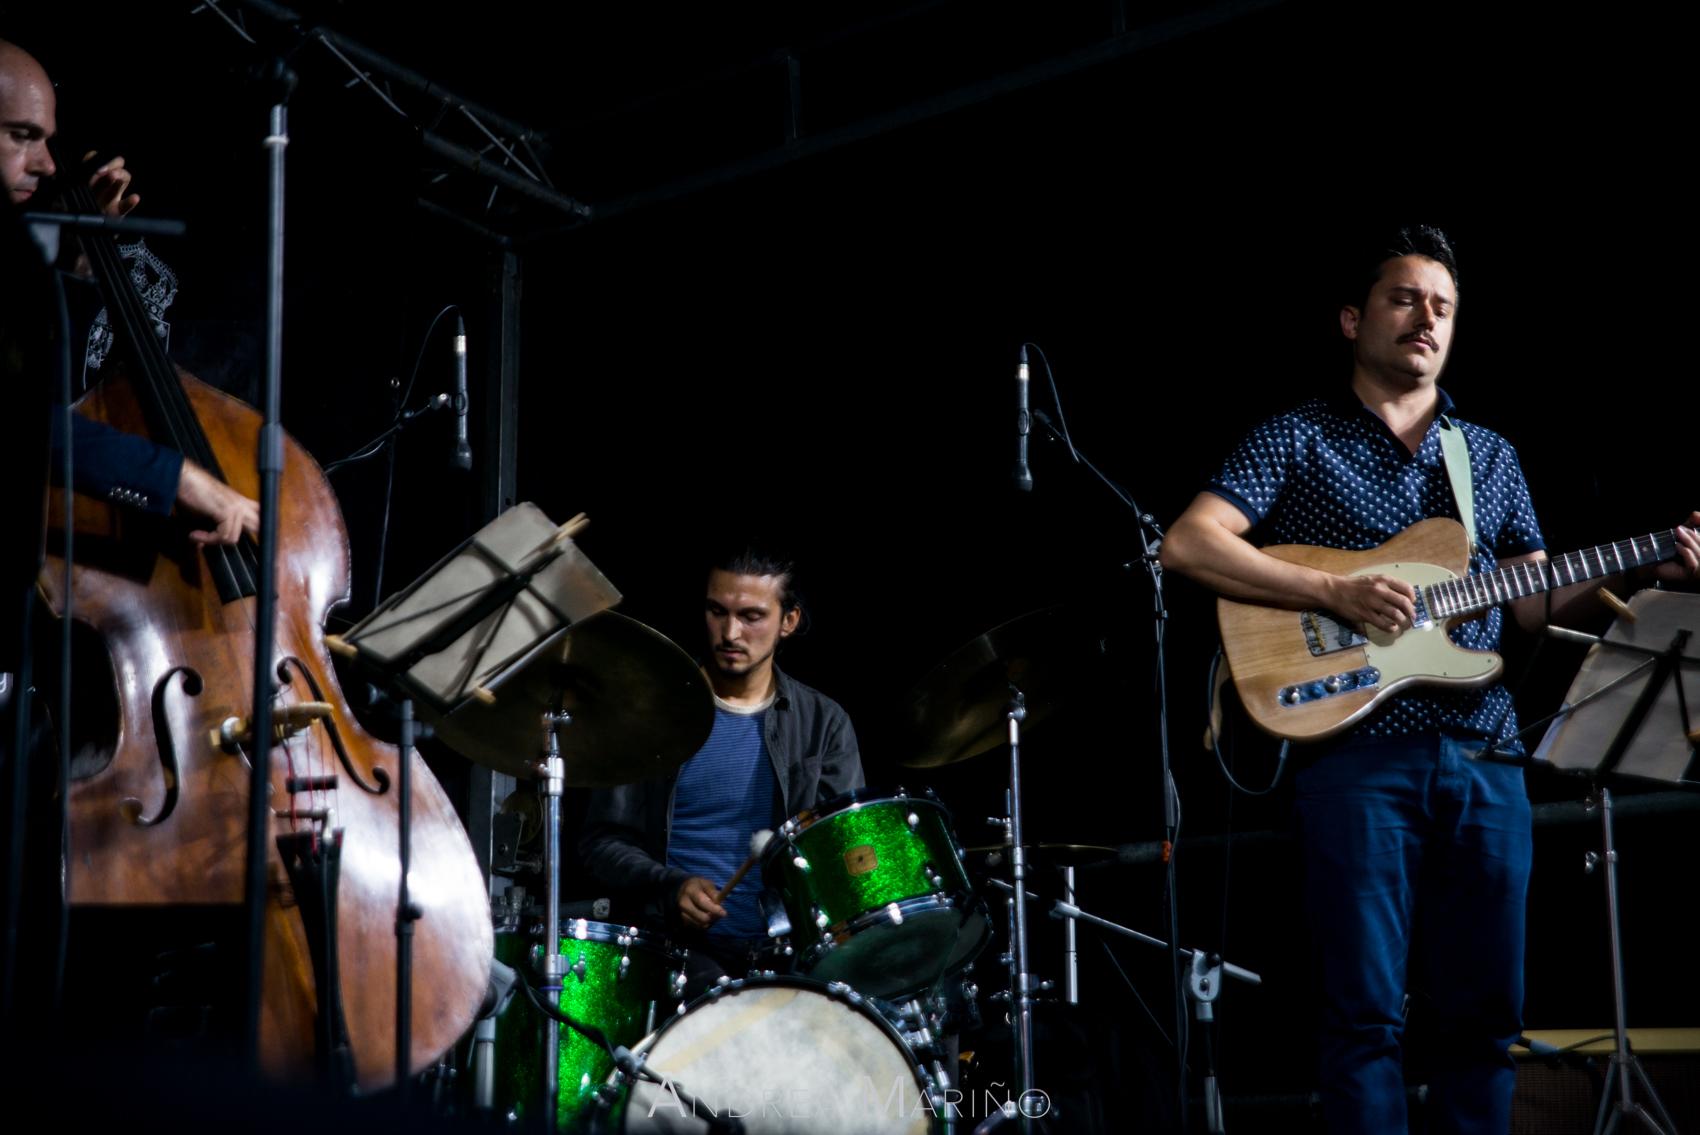 Andrea Mariño. Gonçalo Leonardo Quartet. Nigránjazz. Nigrán. 28/7/17